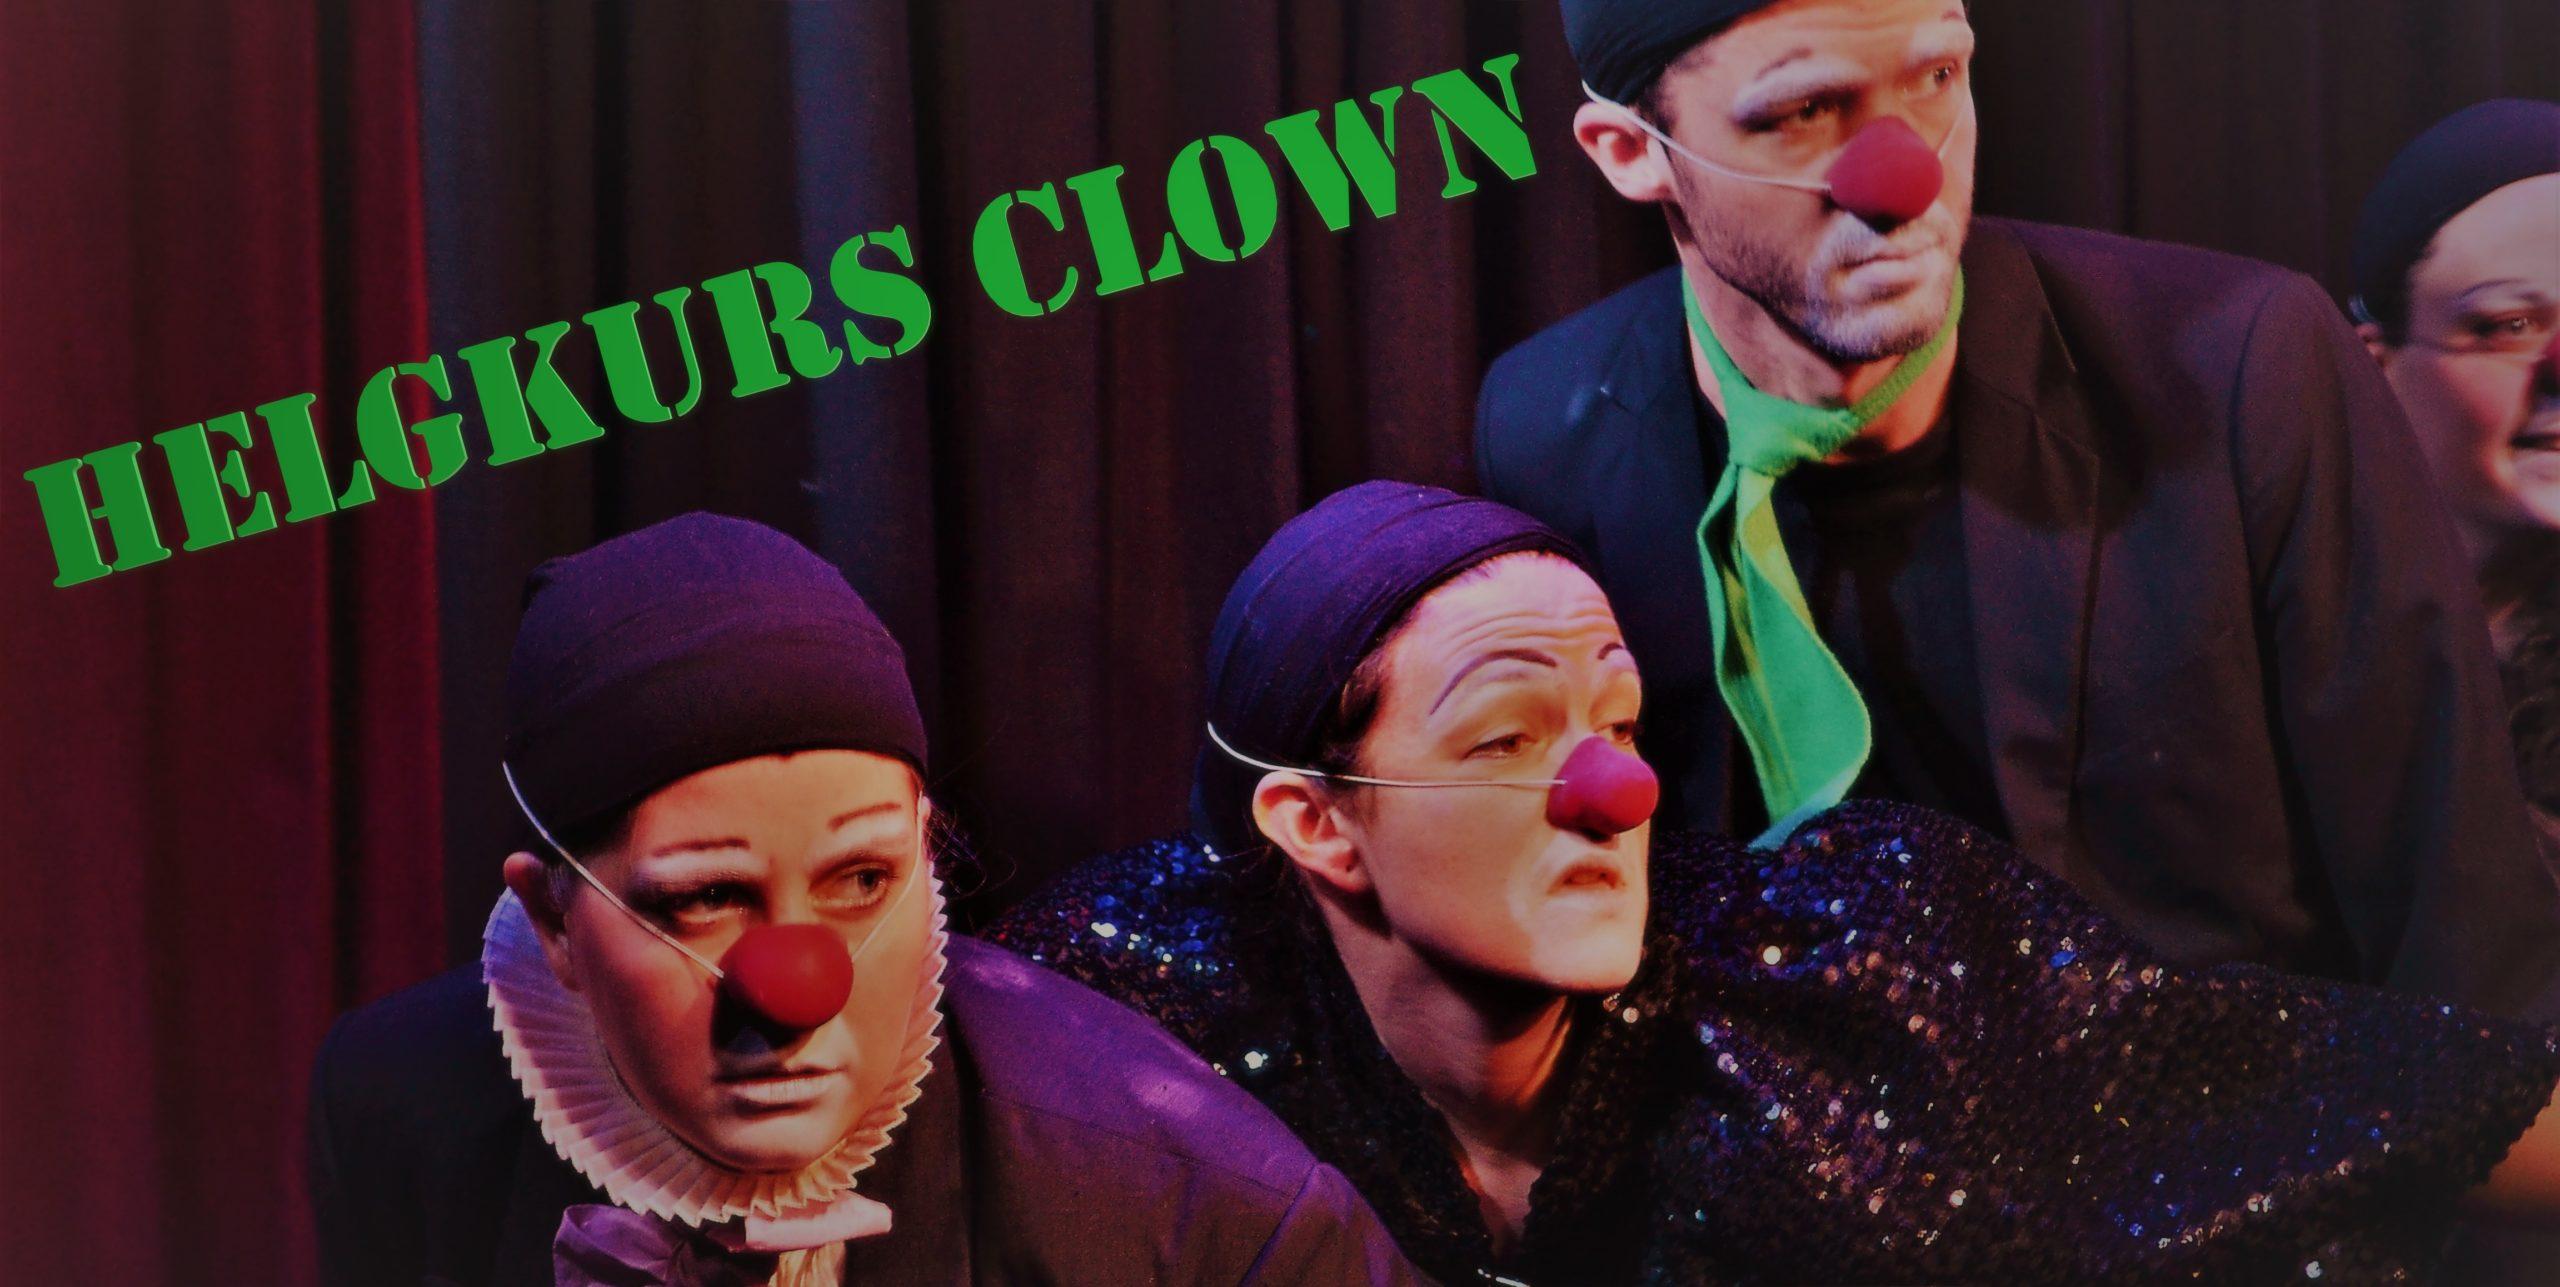 helgkurs CLown